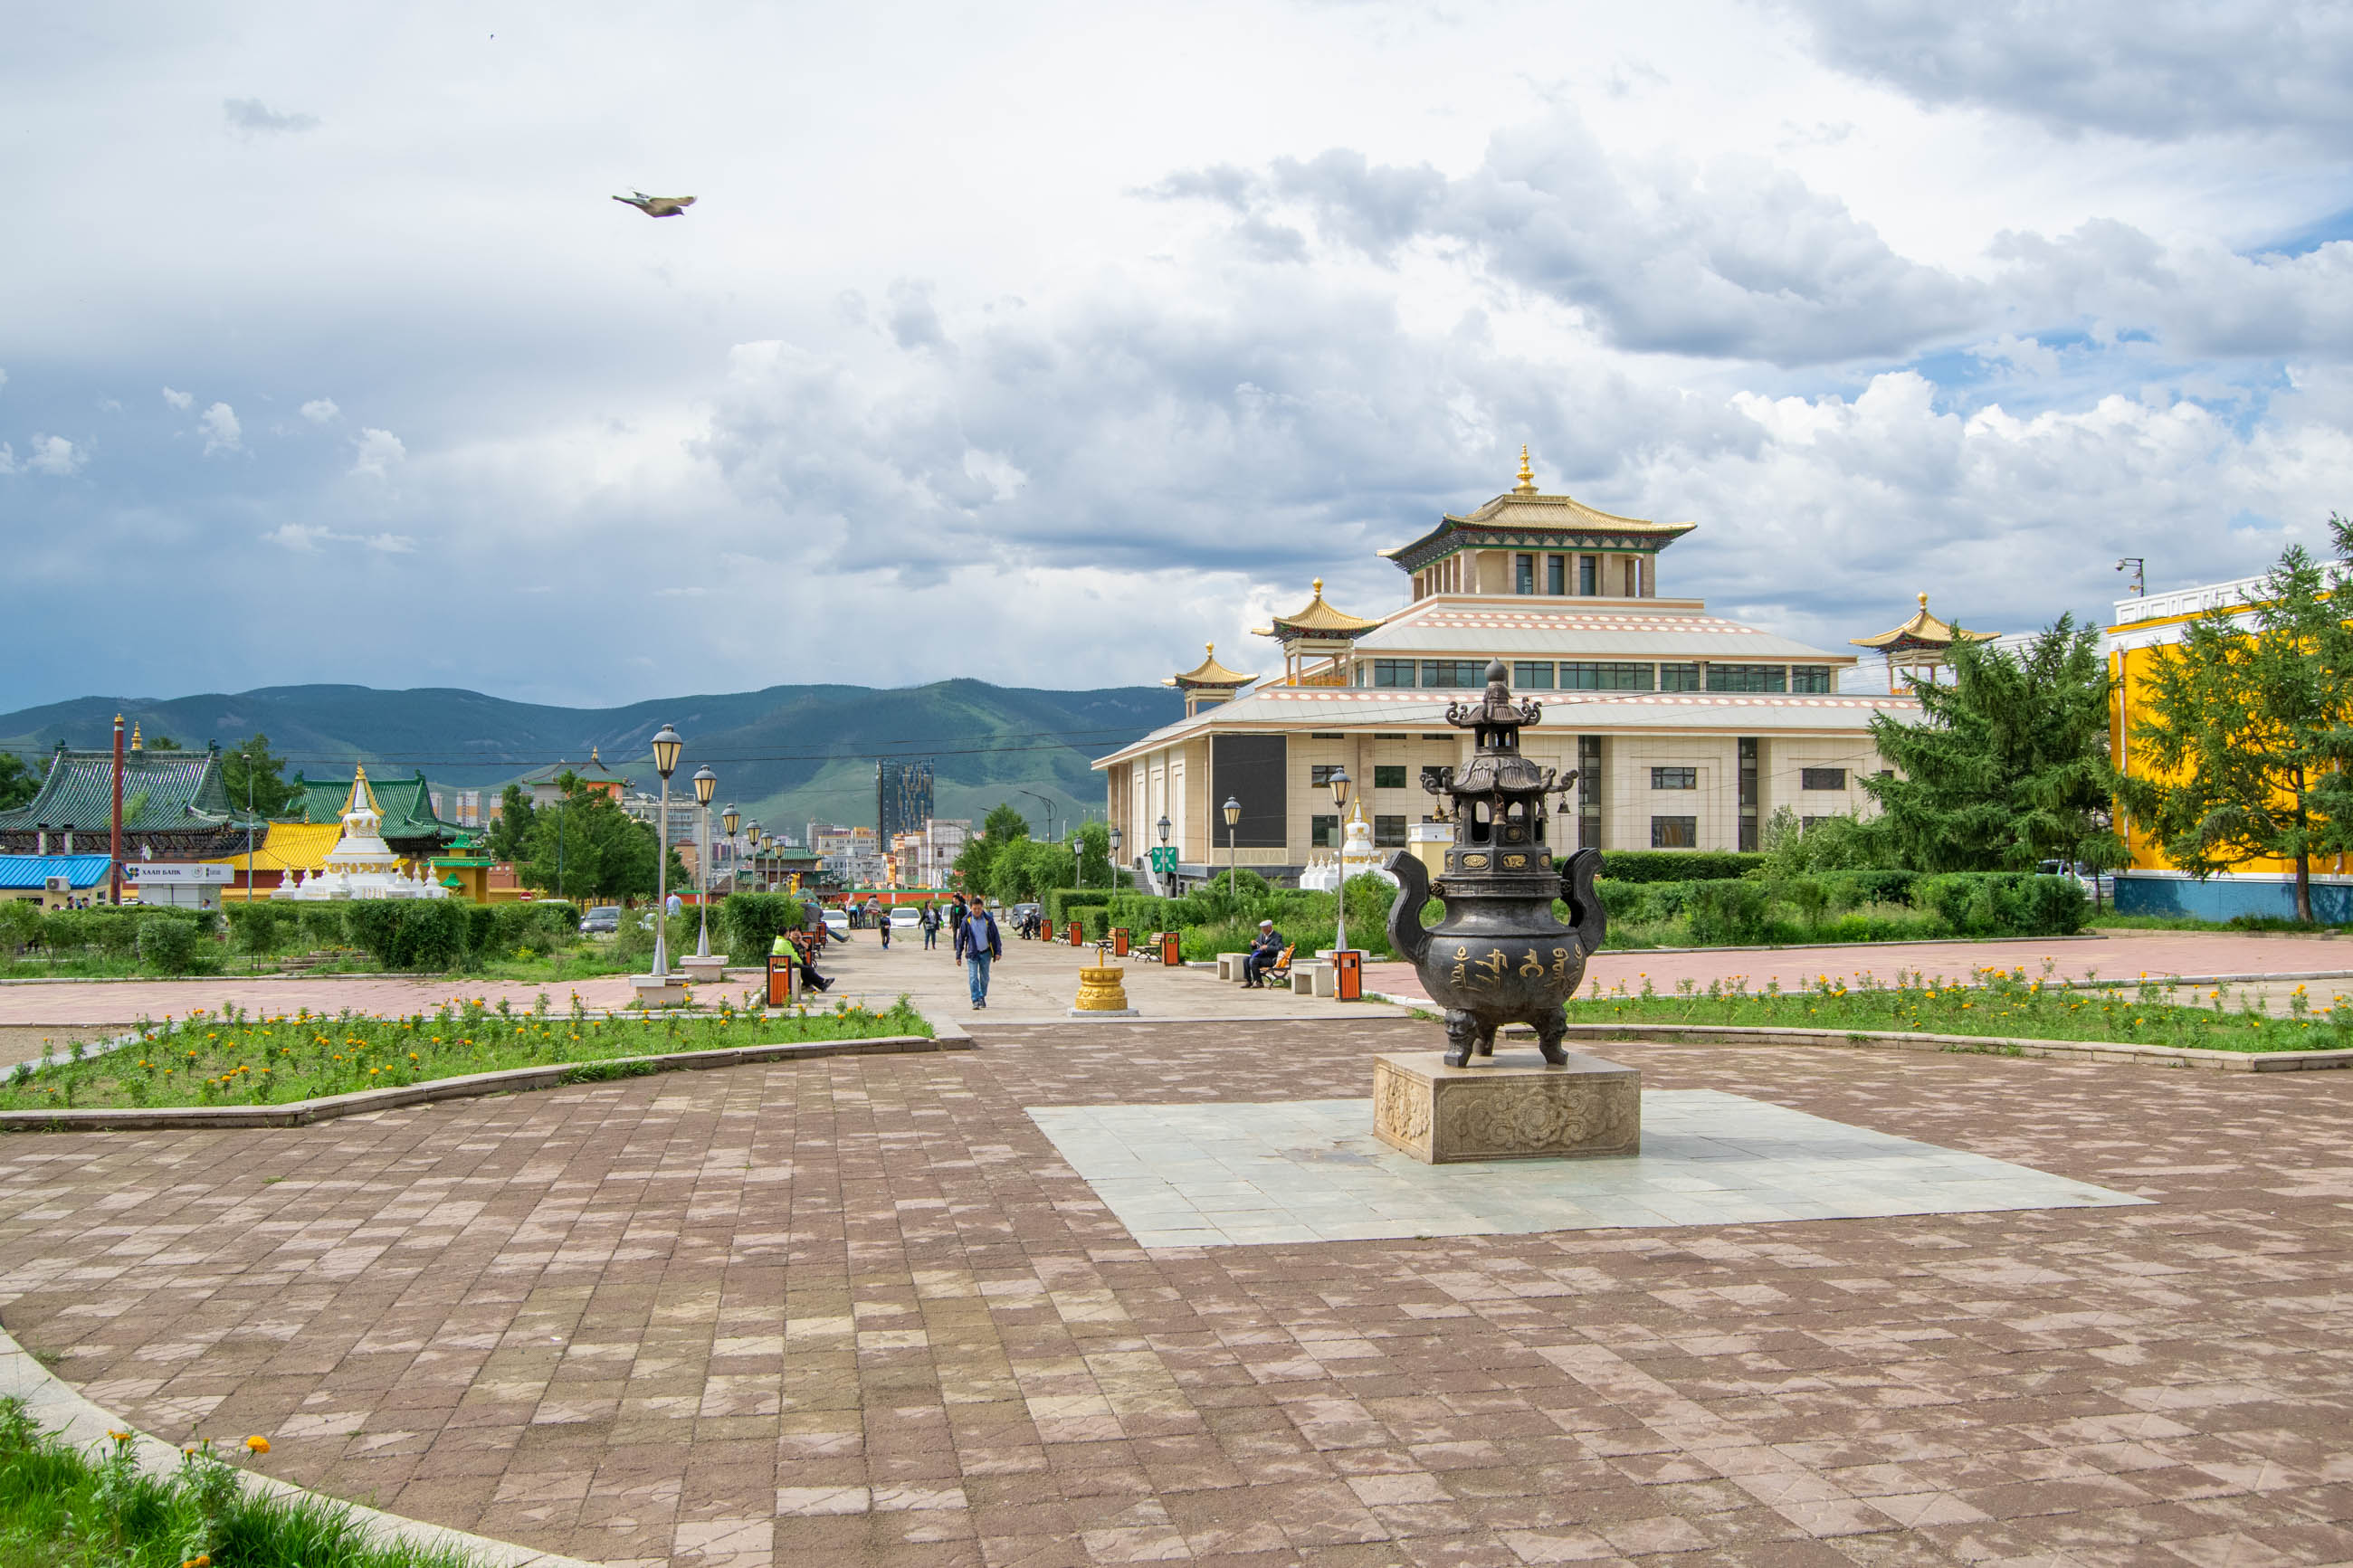 https://bubo.sk/uploads/galleries/4924/martinlipinsky_mongolsko_ulanbatar_budhchram_dsc0608.jpg